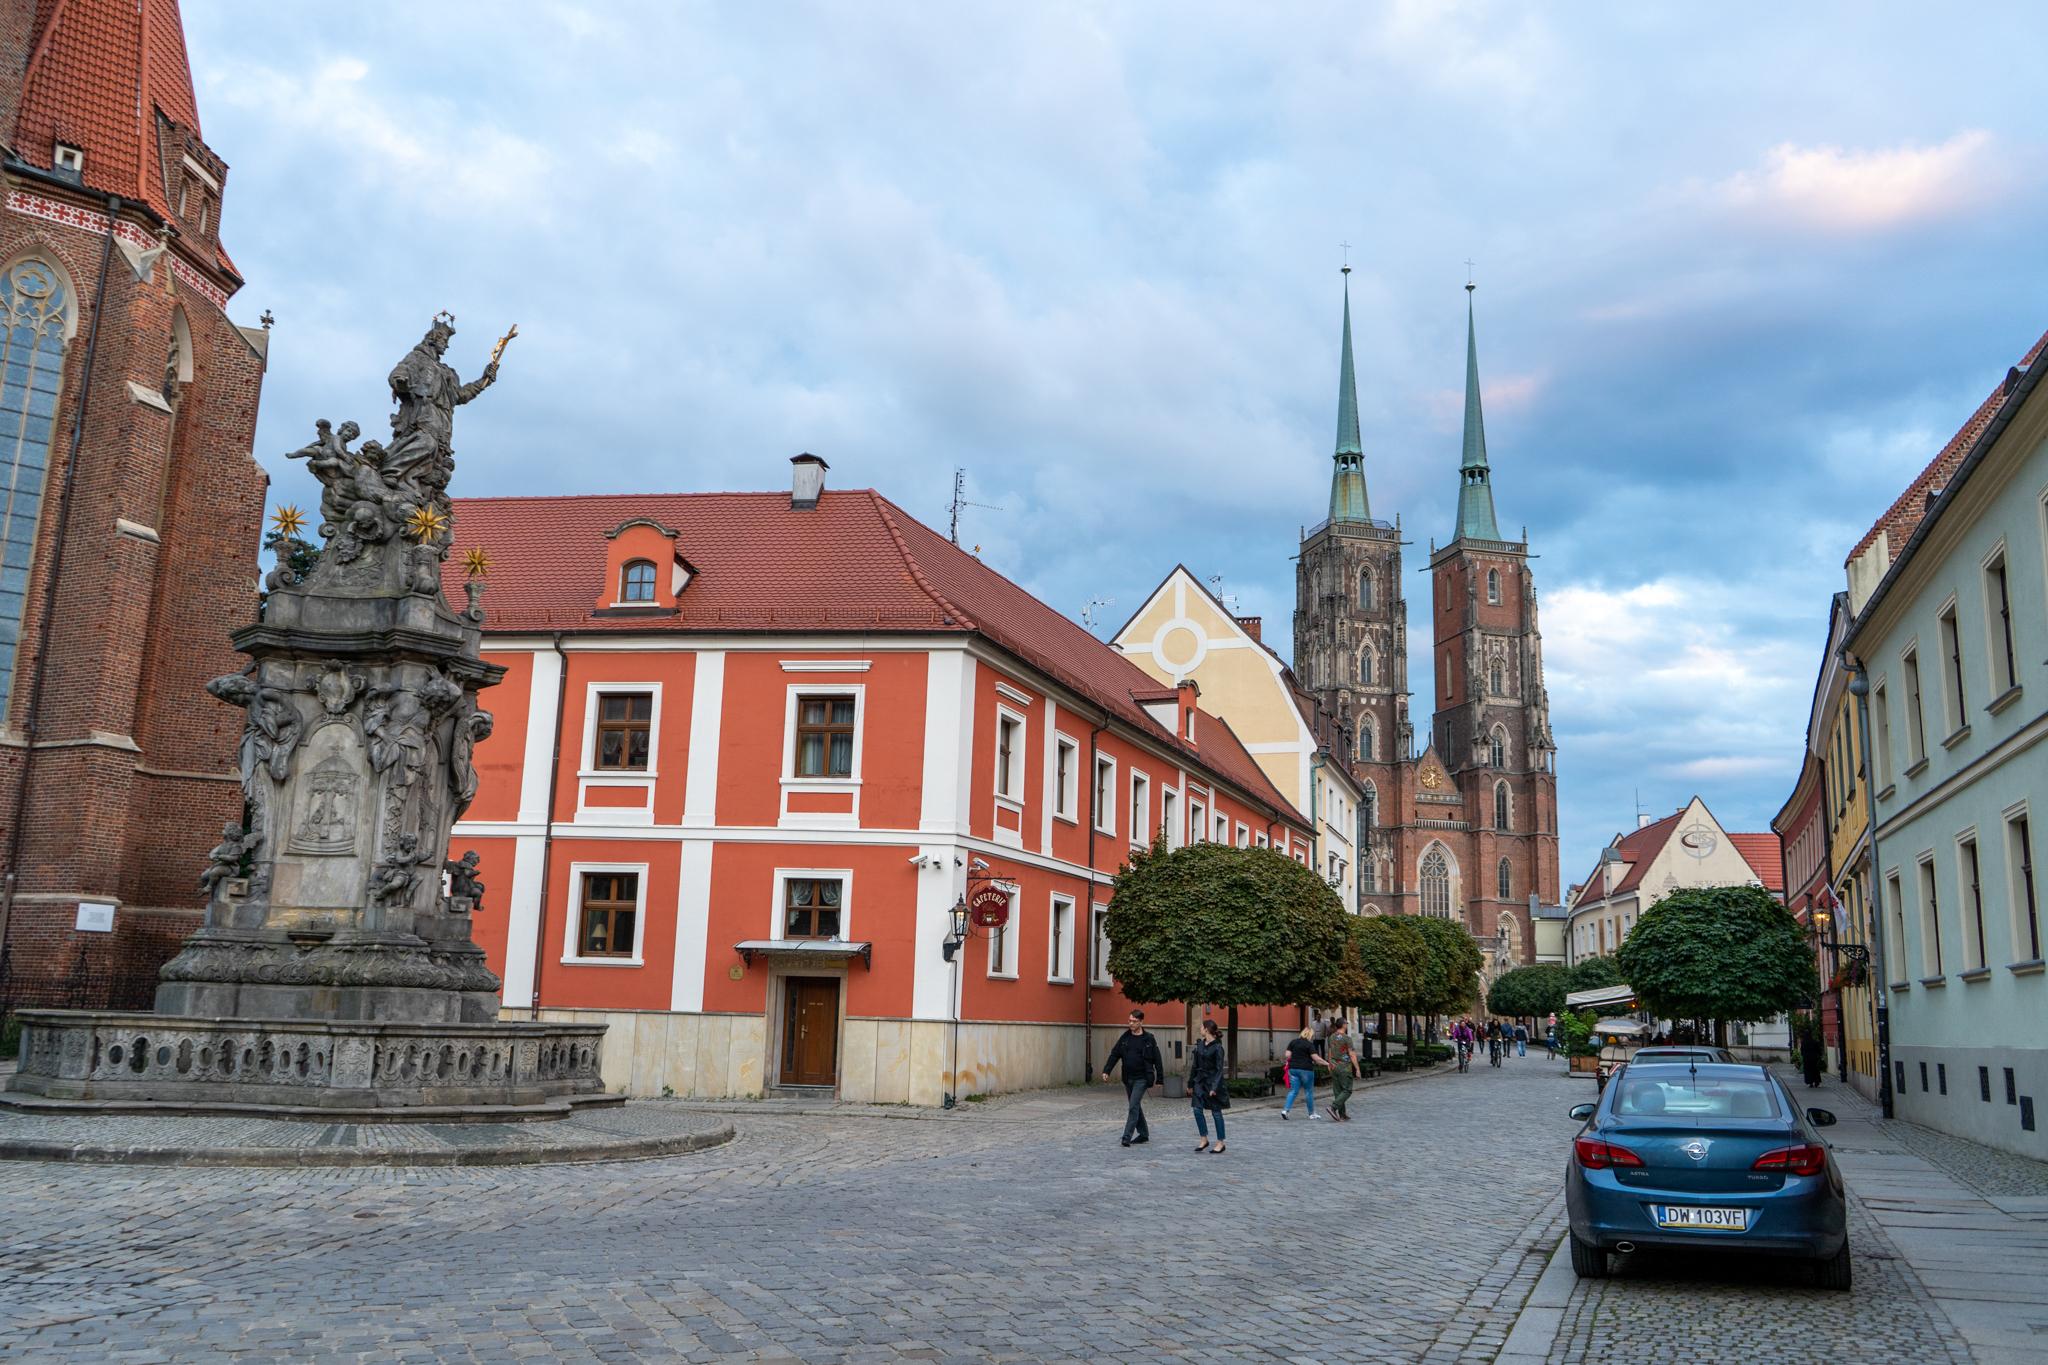 Breslau Sehenswürdigkeiten: Breslau Dom